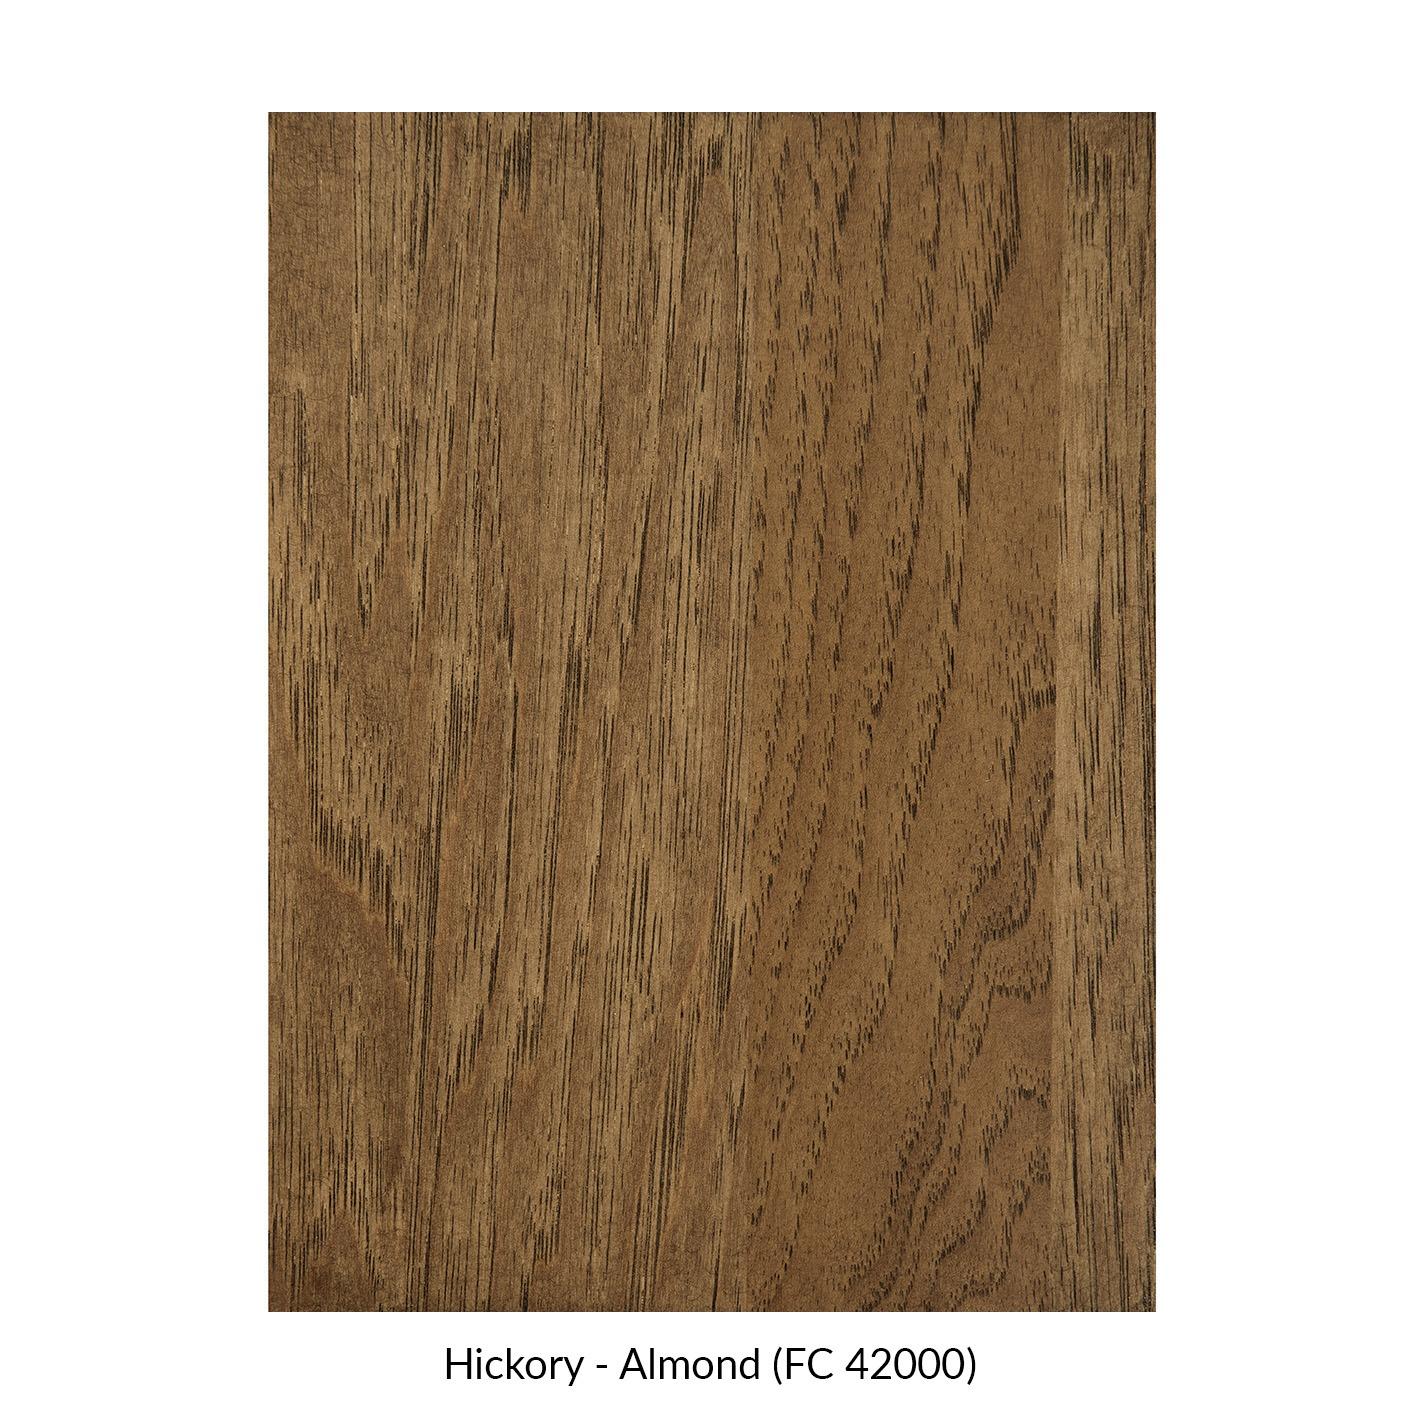 spectrum-hickory-almond-fc-42000.jpg